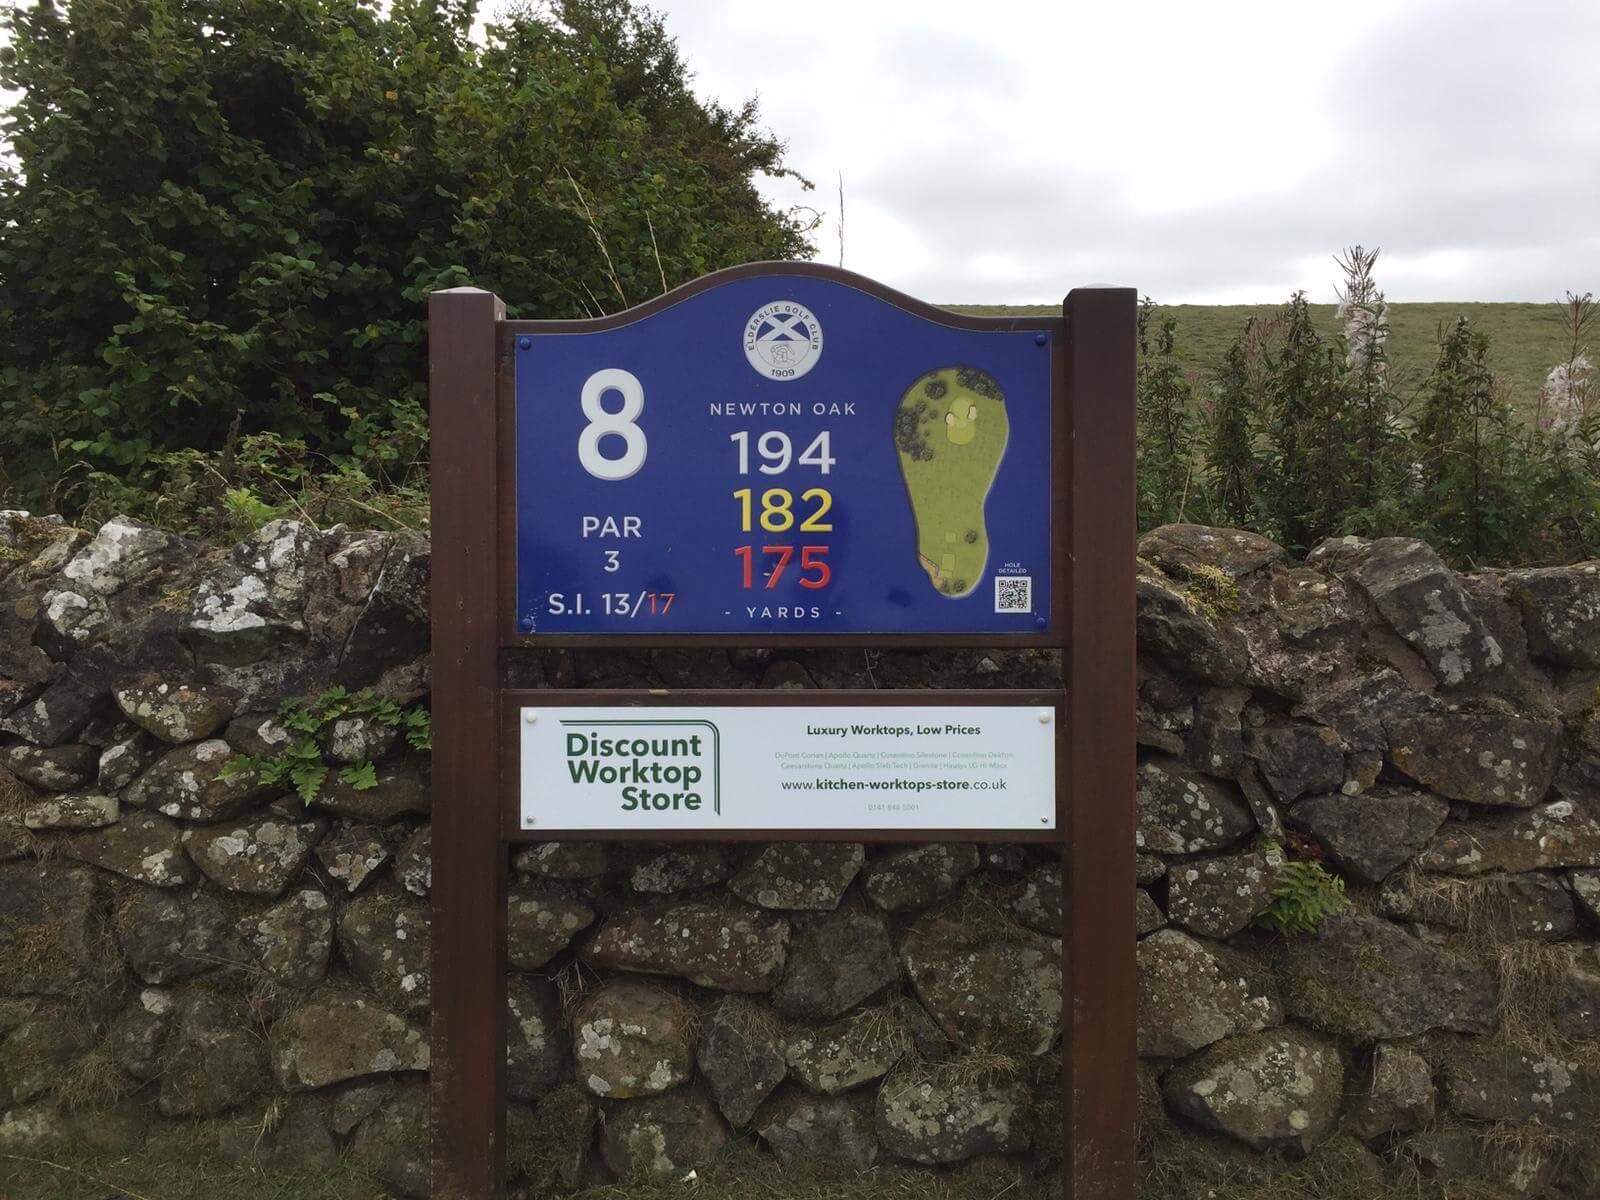 sponsor of the 8th hole at Elderslie Golf Club